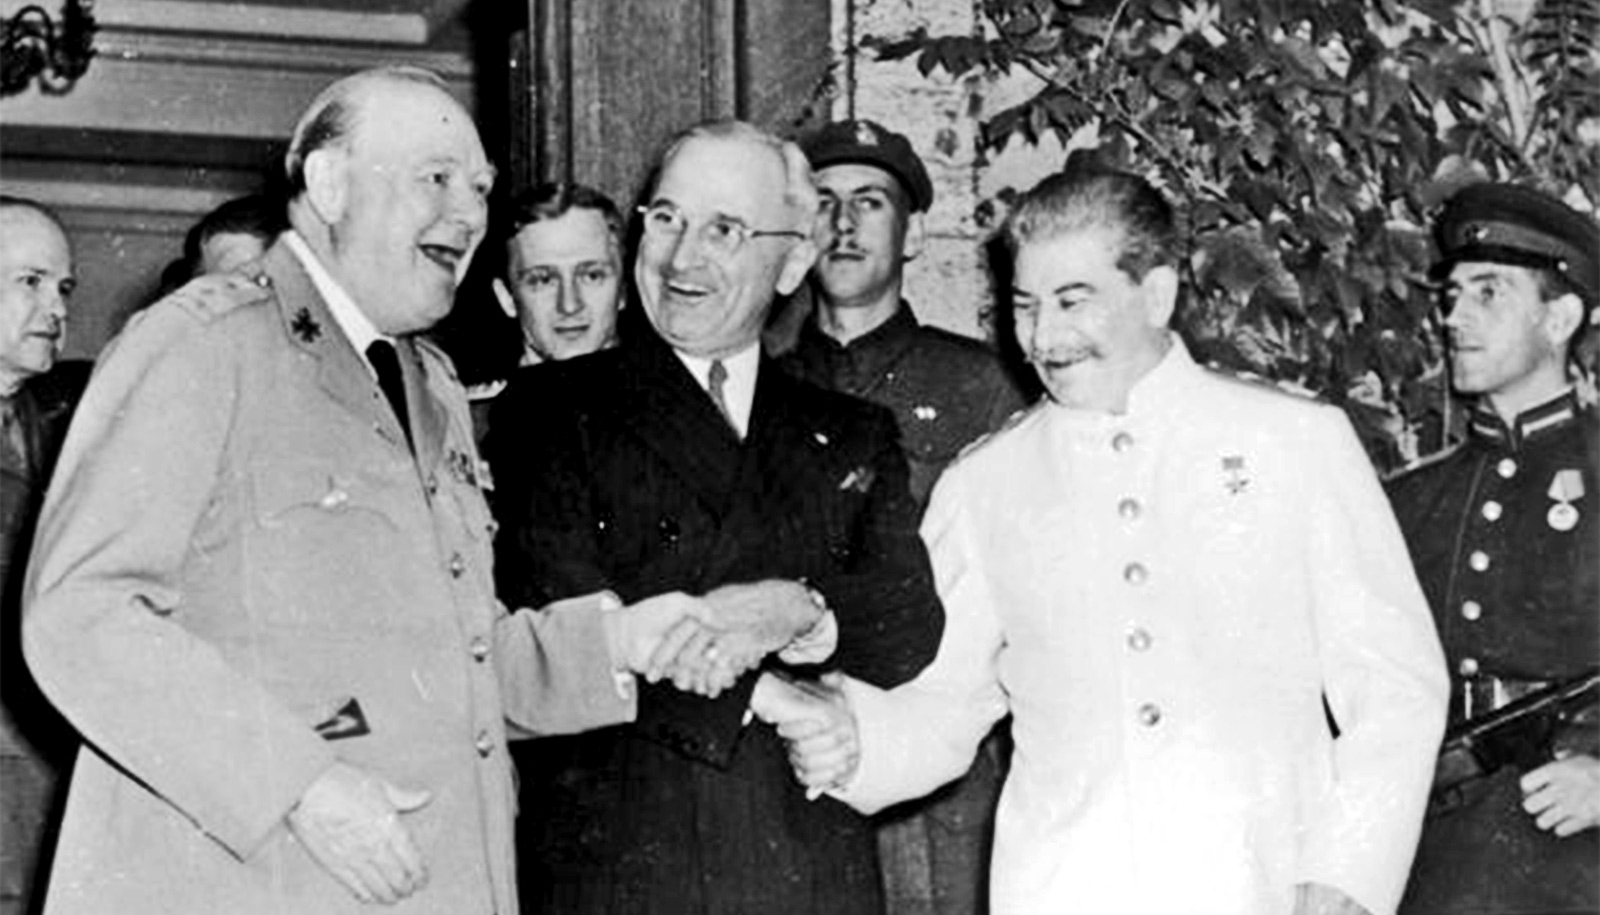 Book: Stalin's backfiring diplomacy led to the Iron Curtain